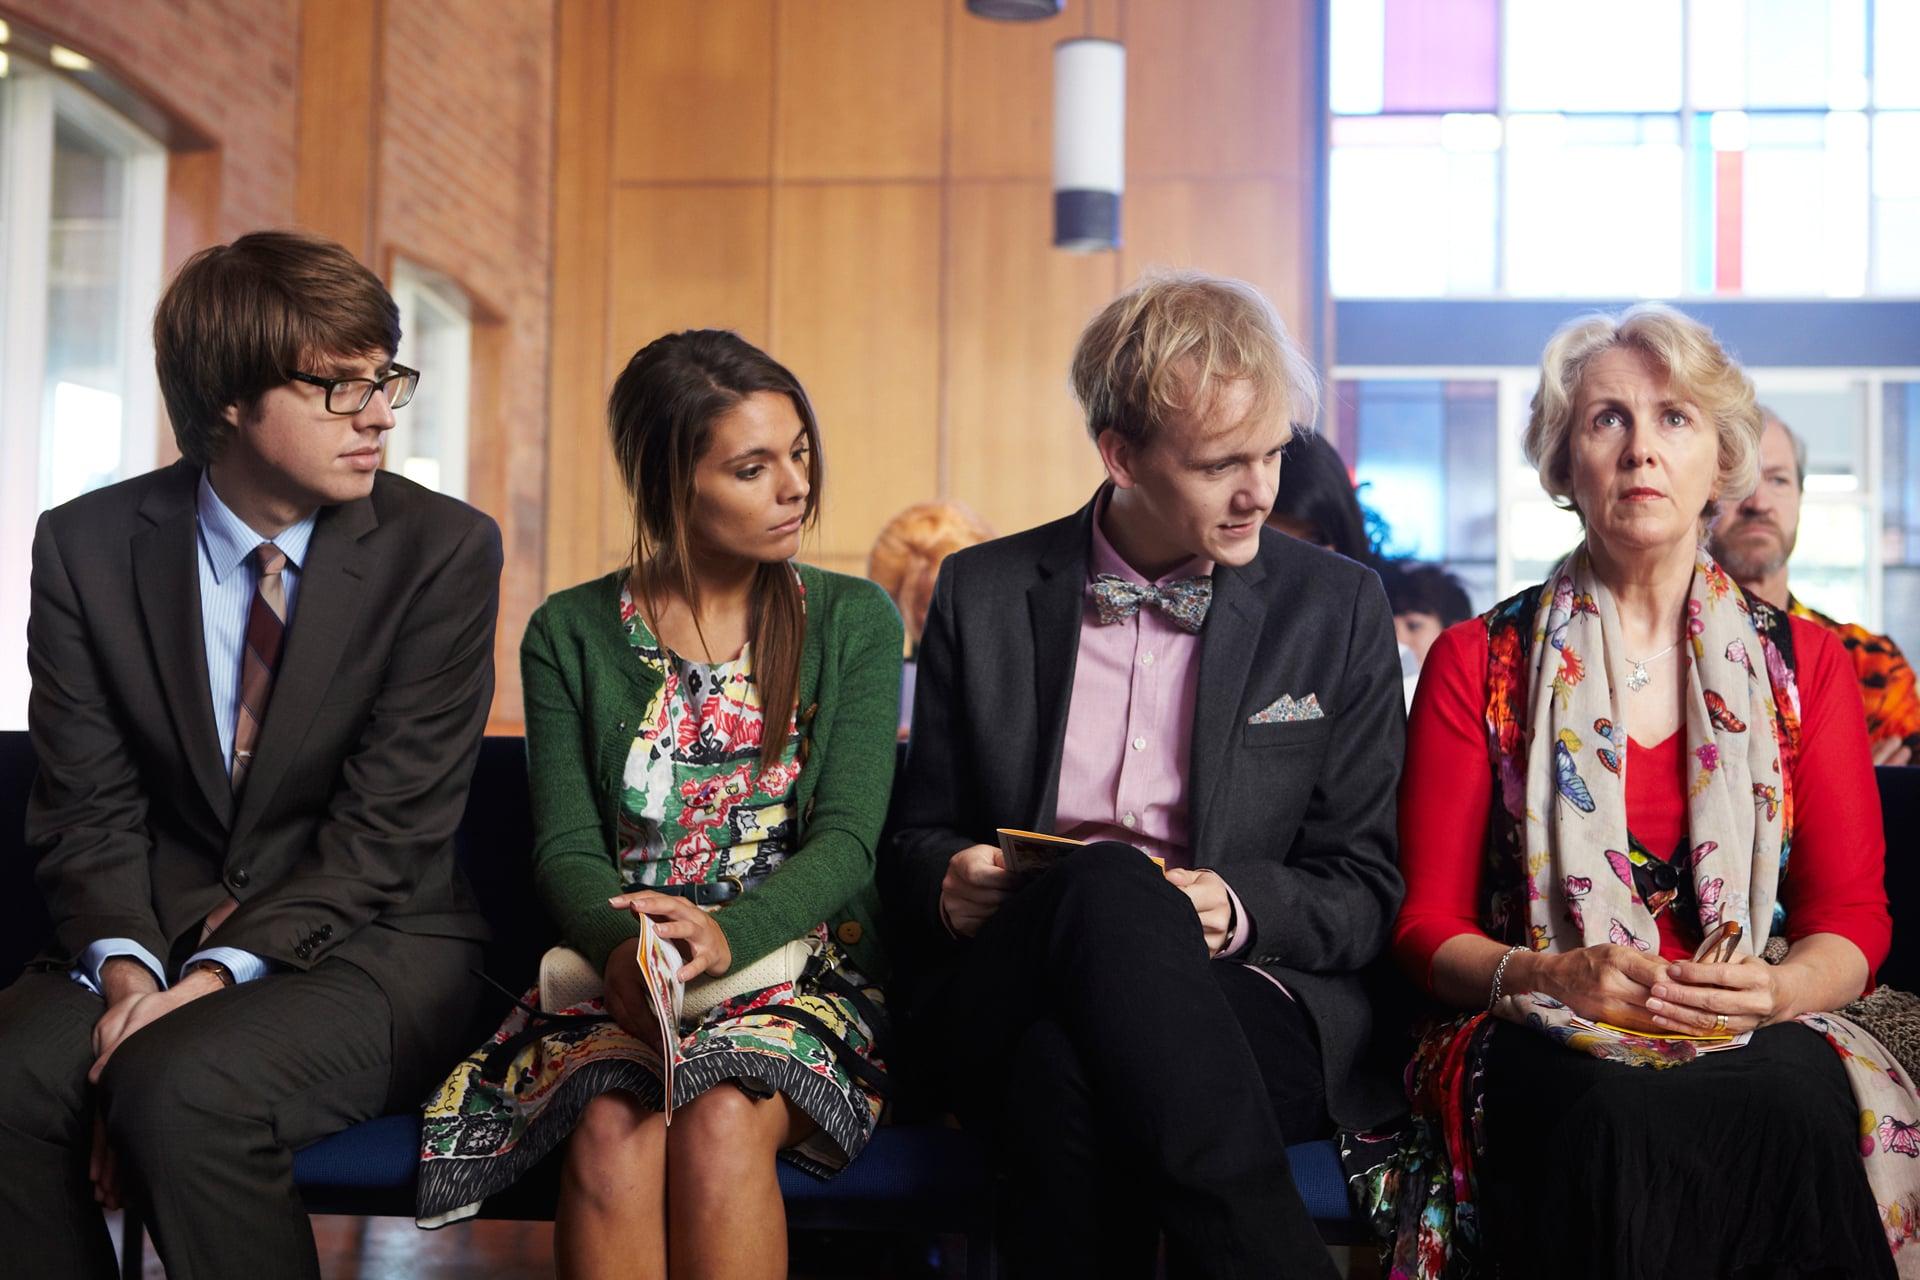 PLEASE LIKE ME, (from left): Tom Ward, Caitlin Stasey, Josh Thomas, Debra Lawrence, (Season 1), 2013-. photo: Narelle Sheean / Pivot/Australian Broadcasting Corp. / Courtesy: Everett Collection